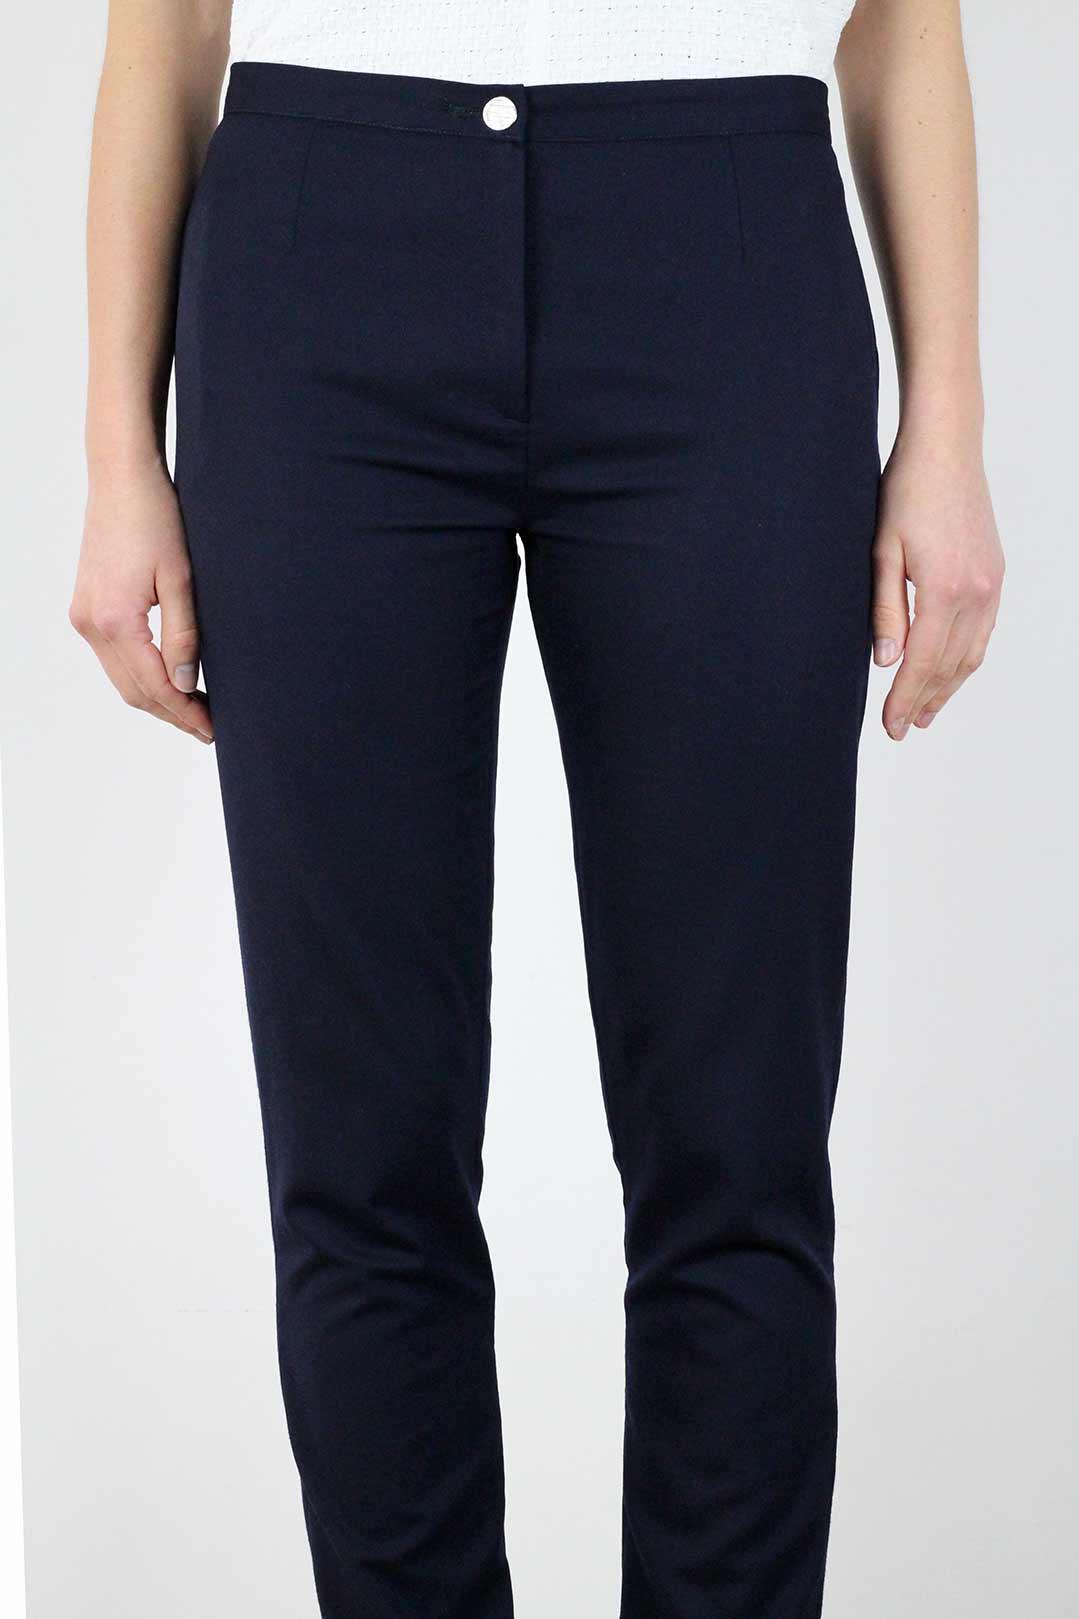 4a44b799d07b Pantalon bleu marine femme, droit, en laine Made in France   ATODE